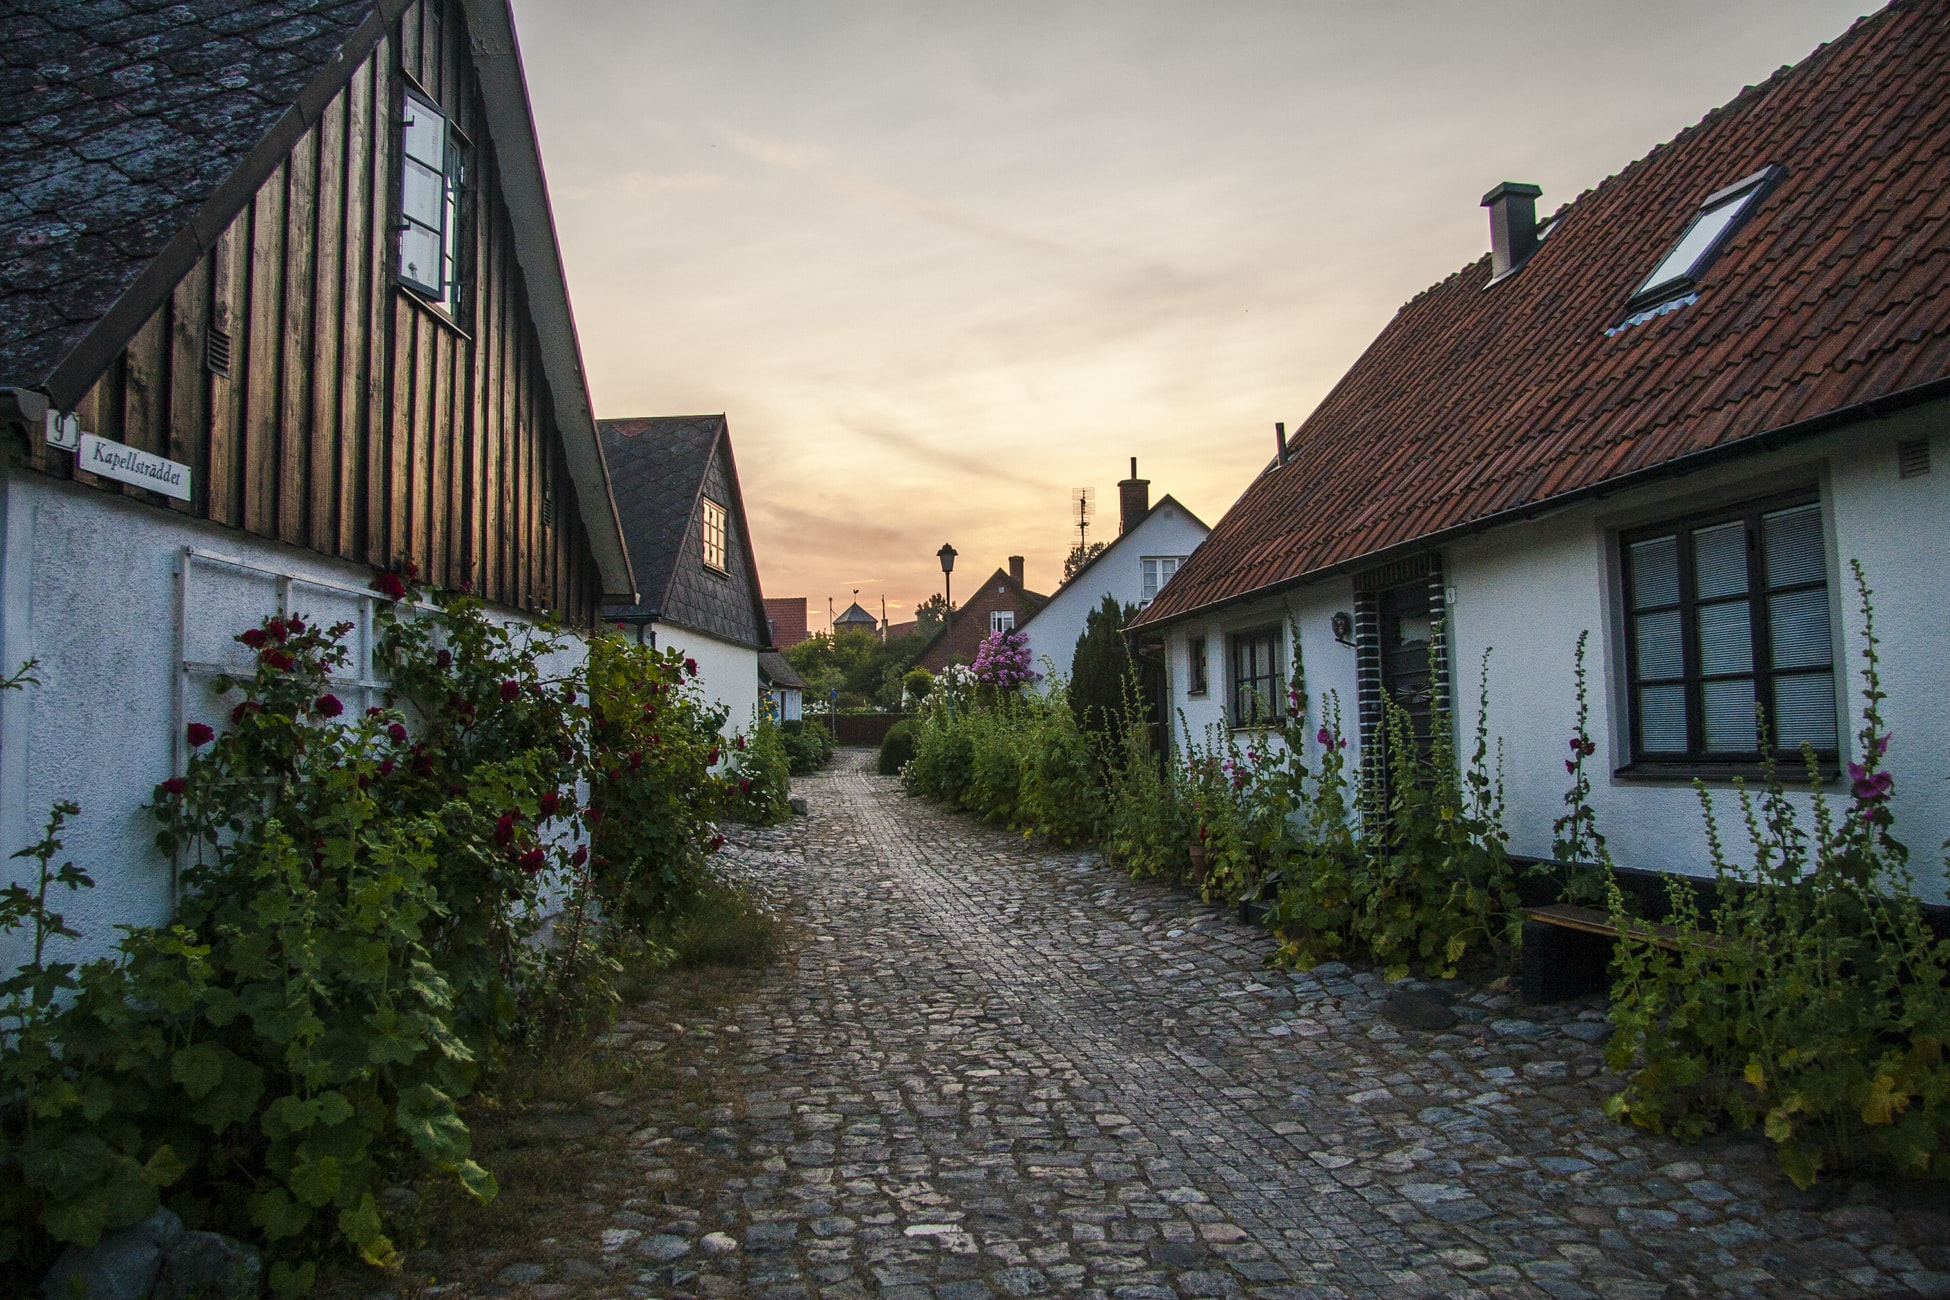 Kontakta oss på Swedtak Skåne AB